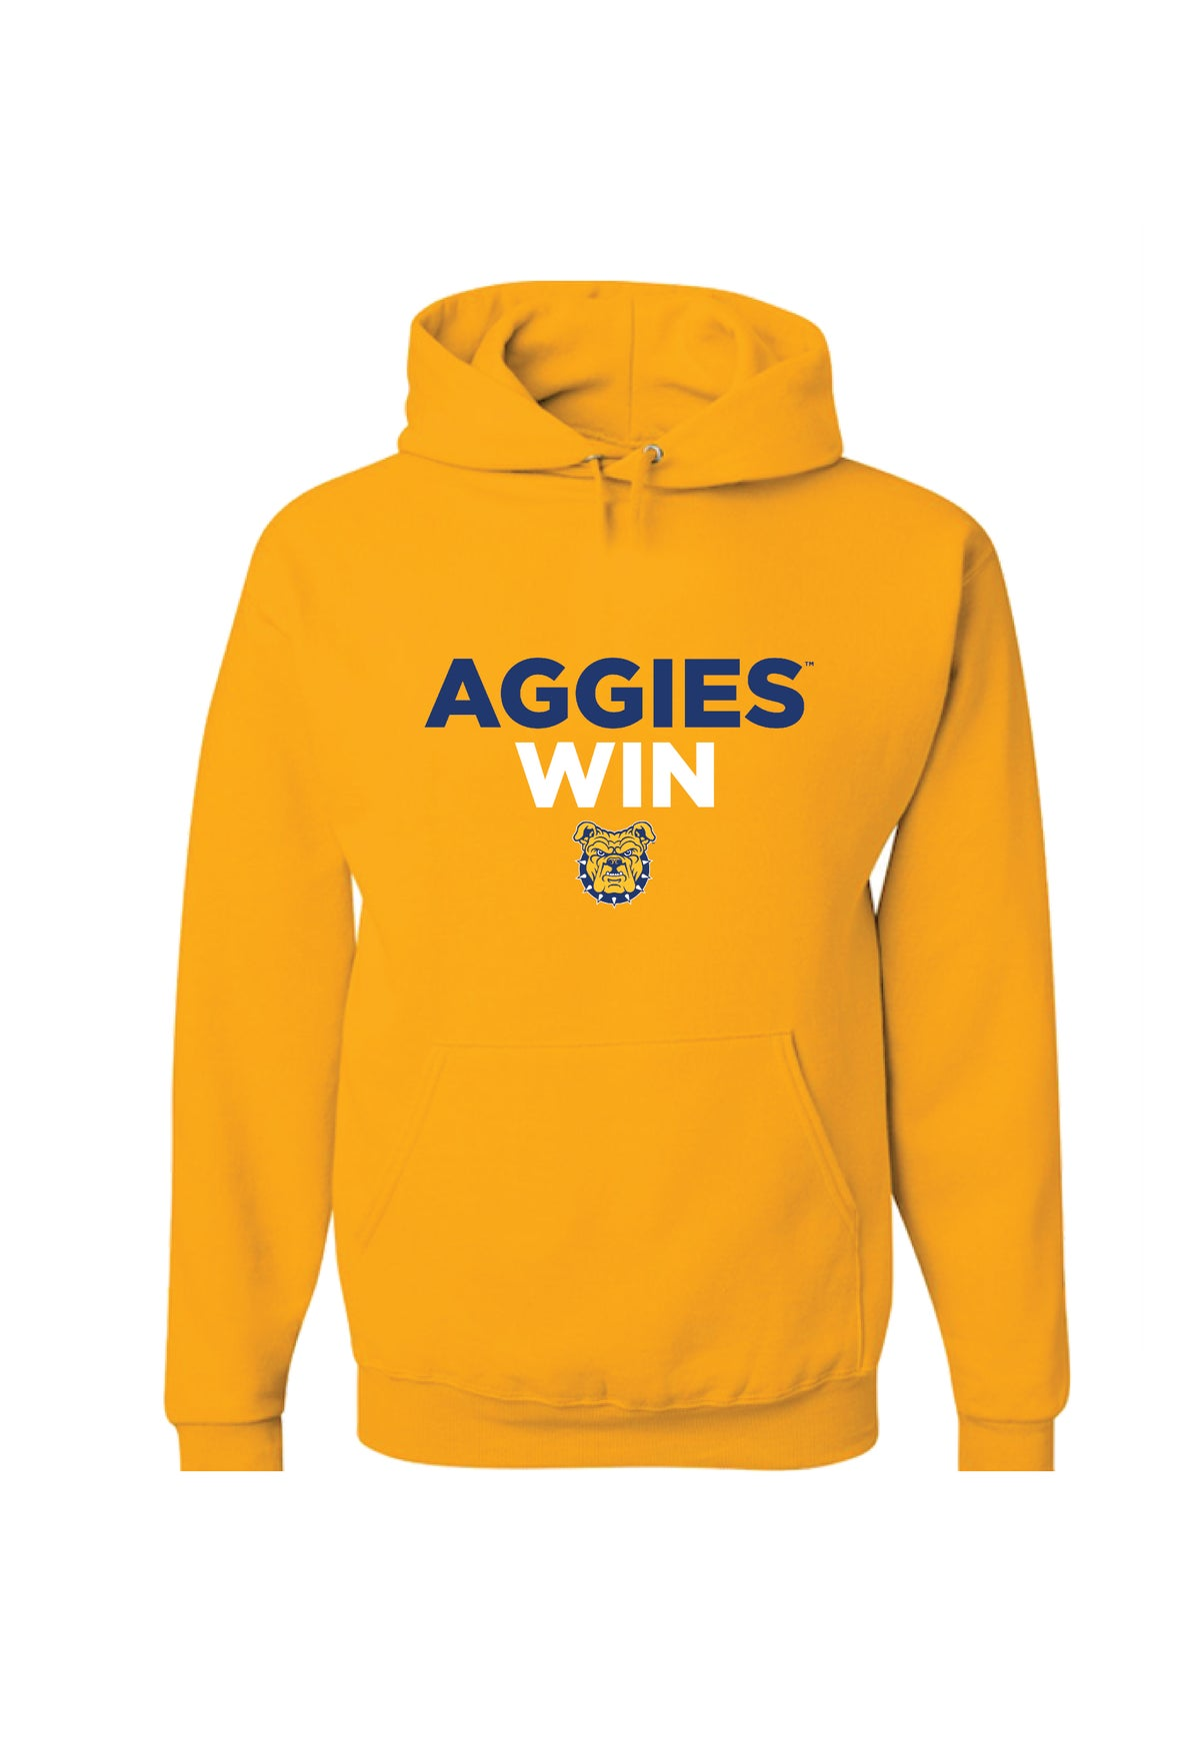 Aggie hoodies